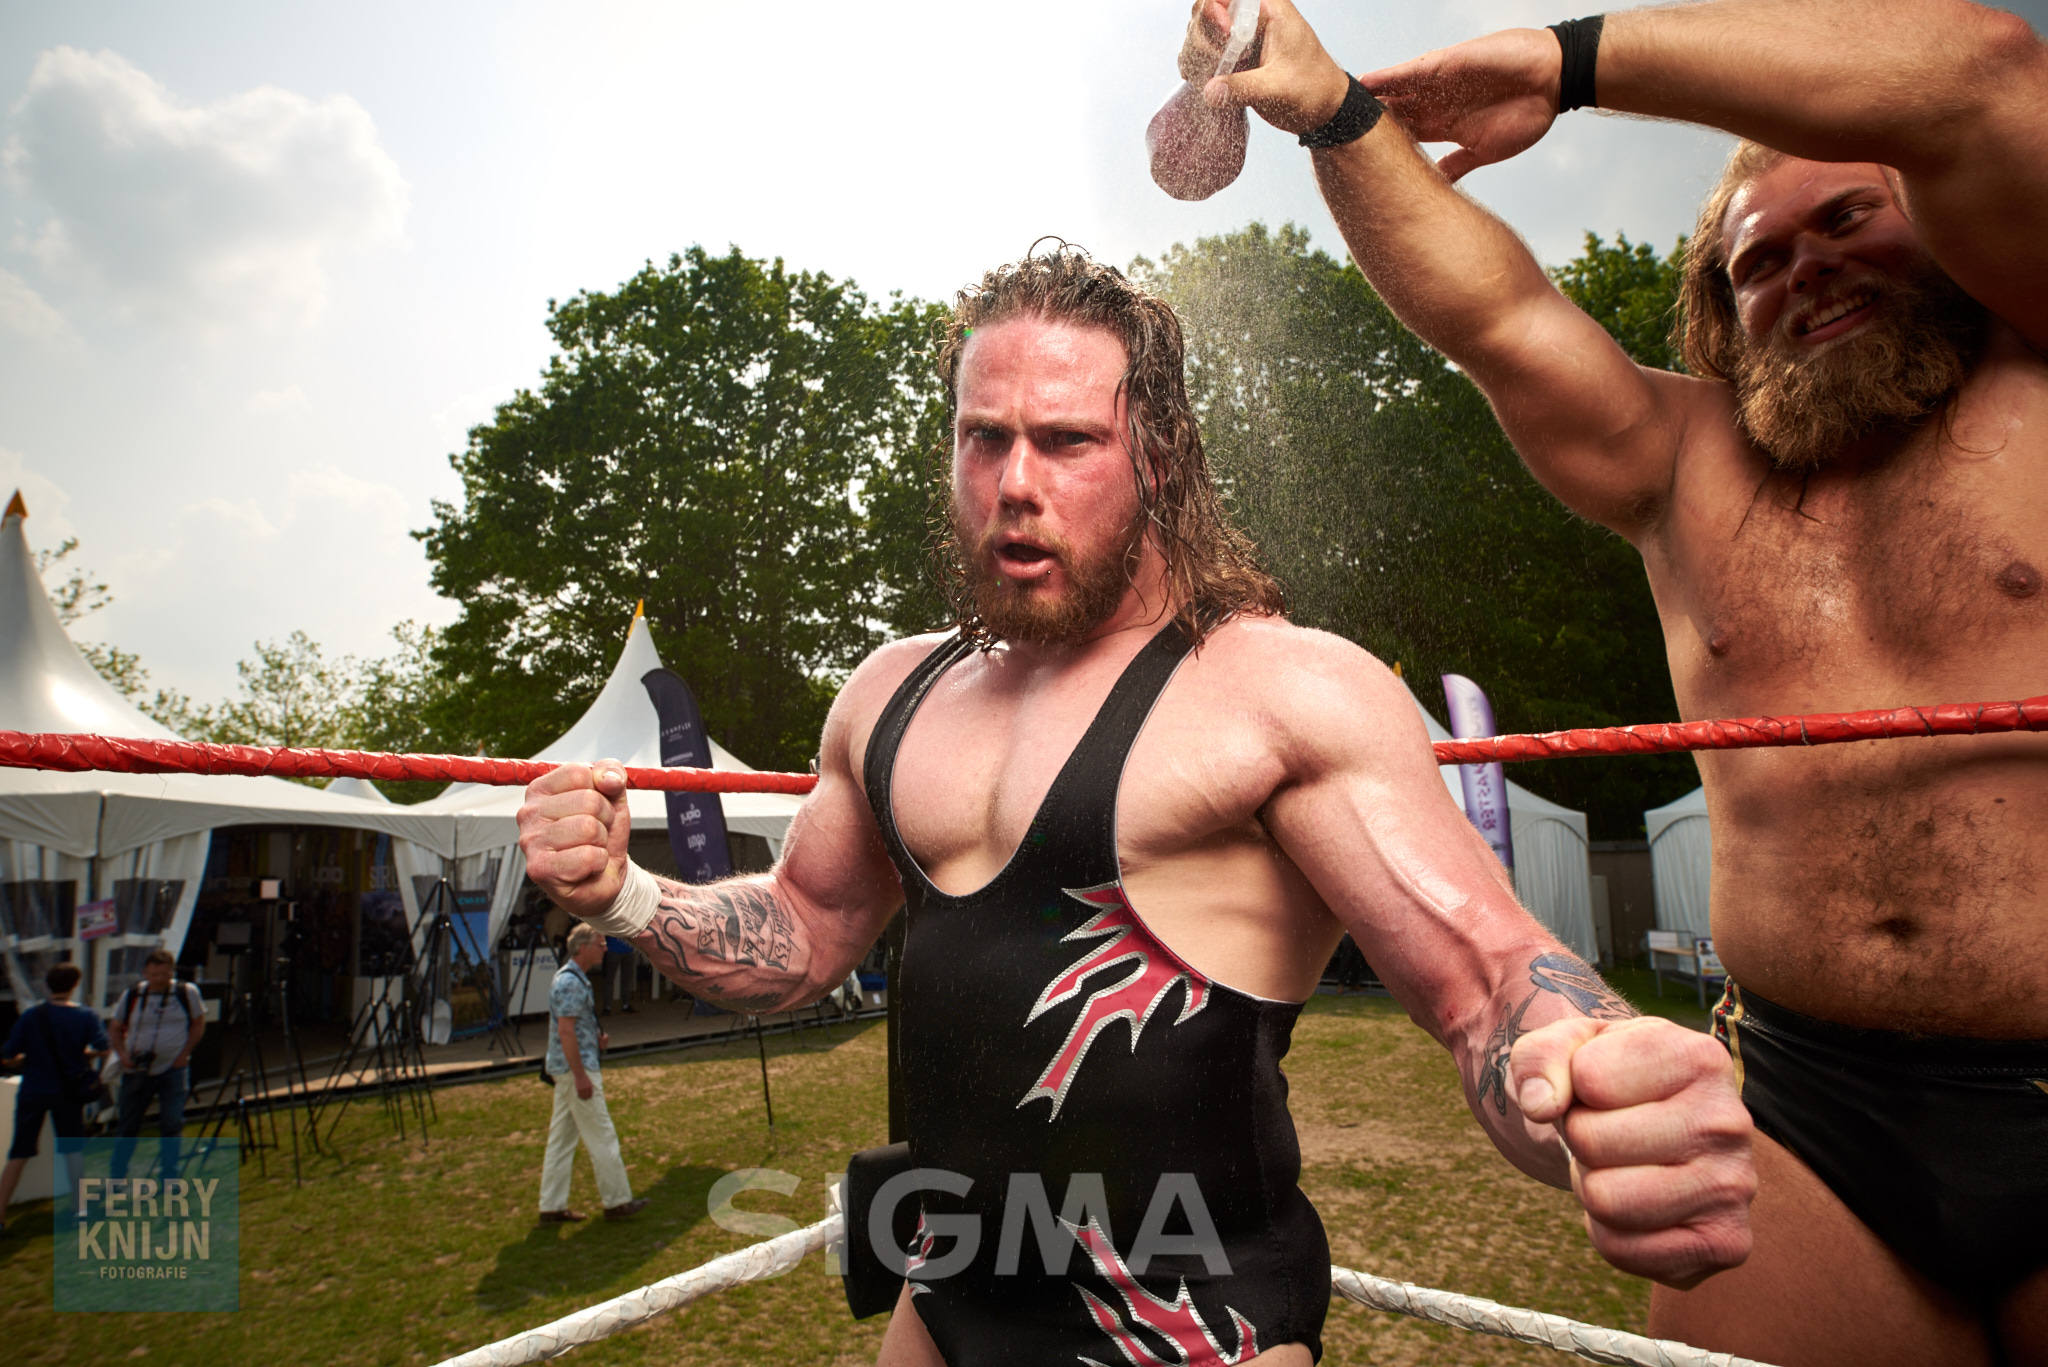 16_05_28_NIKON D750_Sigma FotoFair Wrestling__DSC0845_HighWeb.jpg